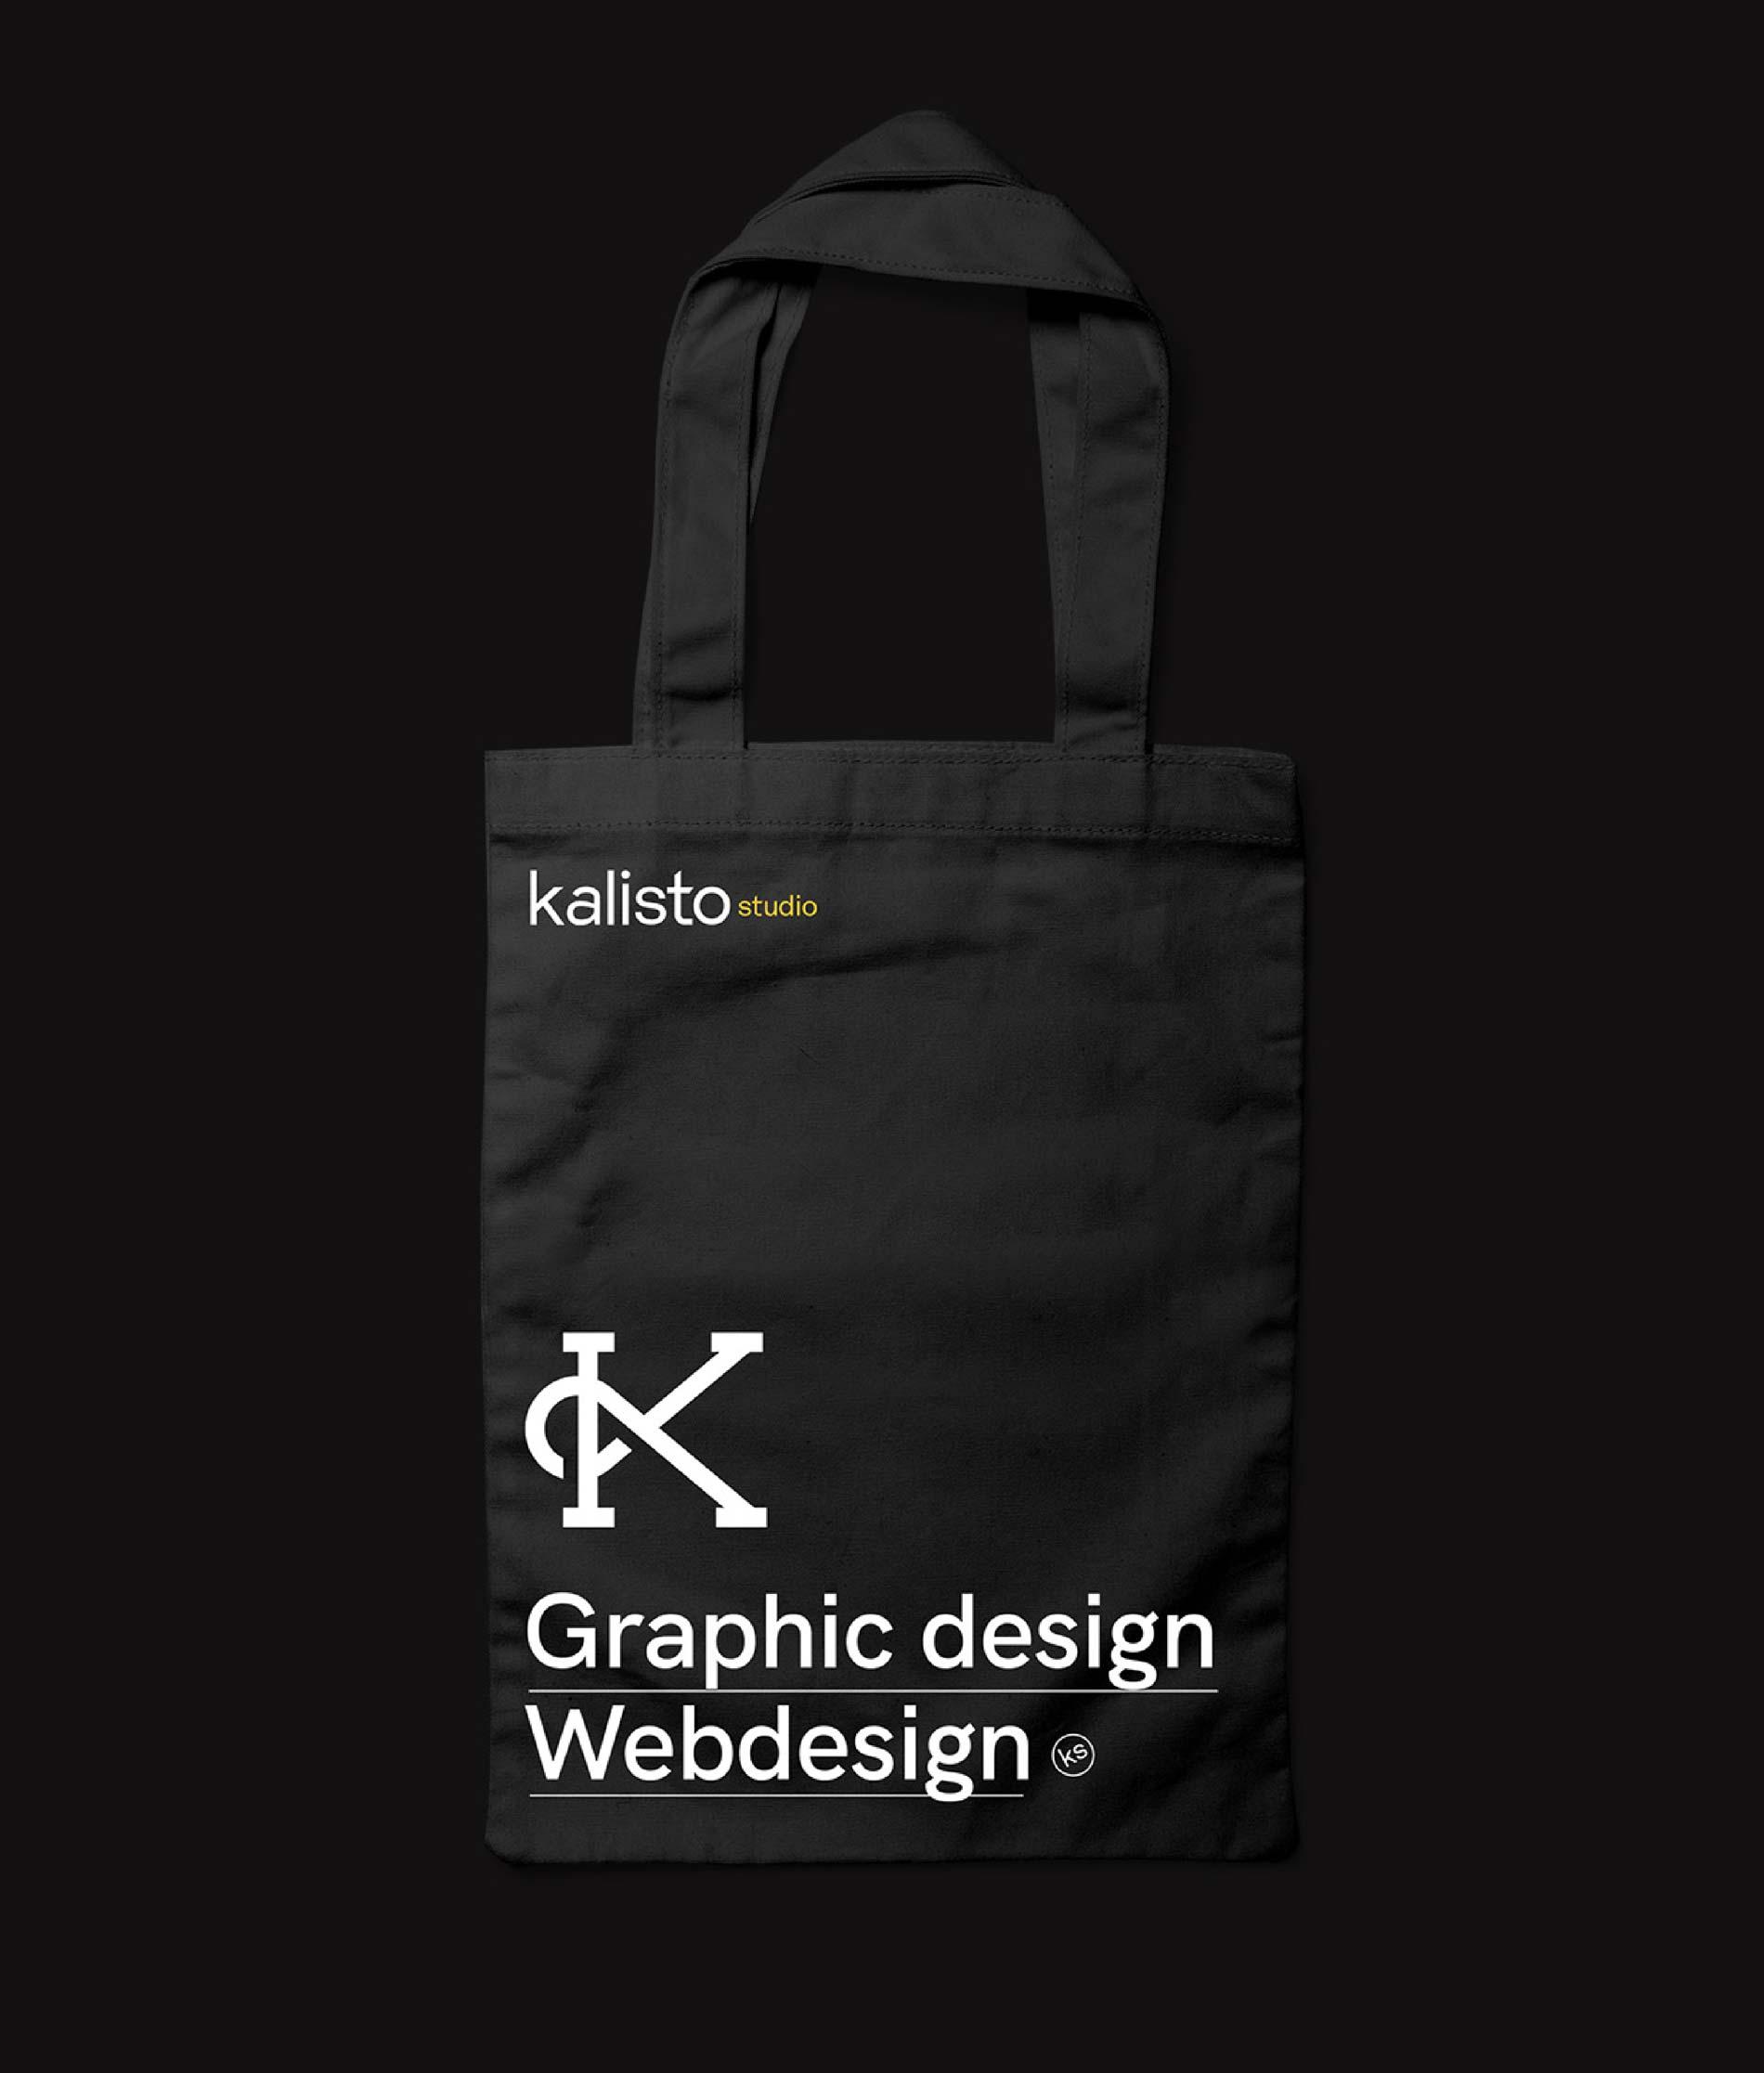 Kalistostudio tote bag mockup branding graphic design webdesign